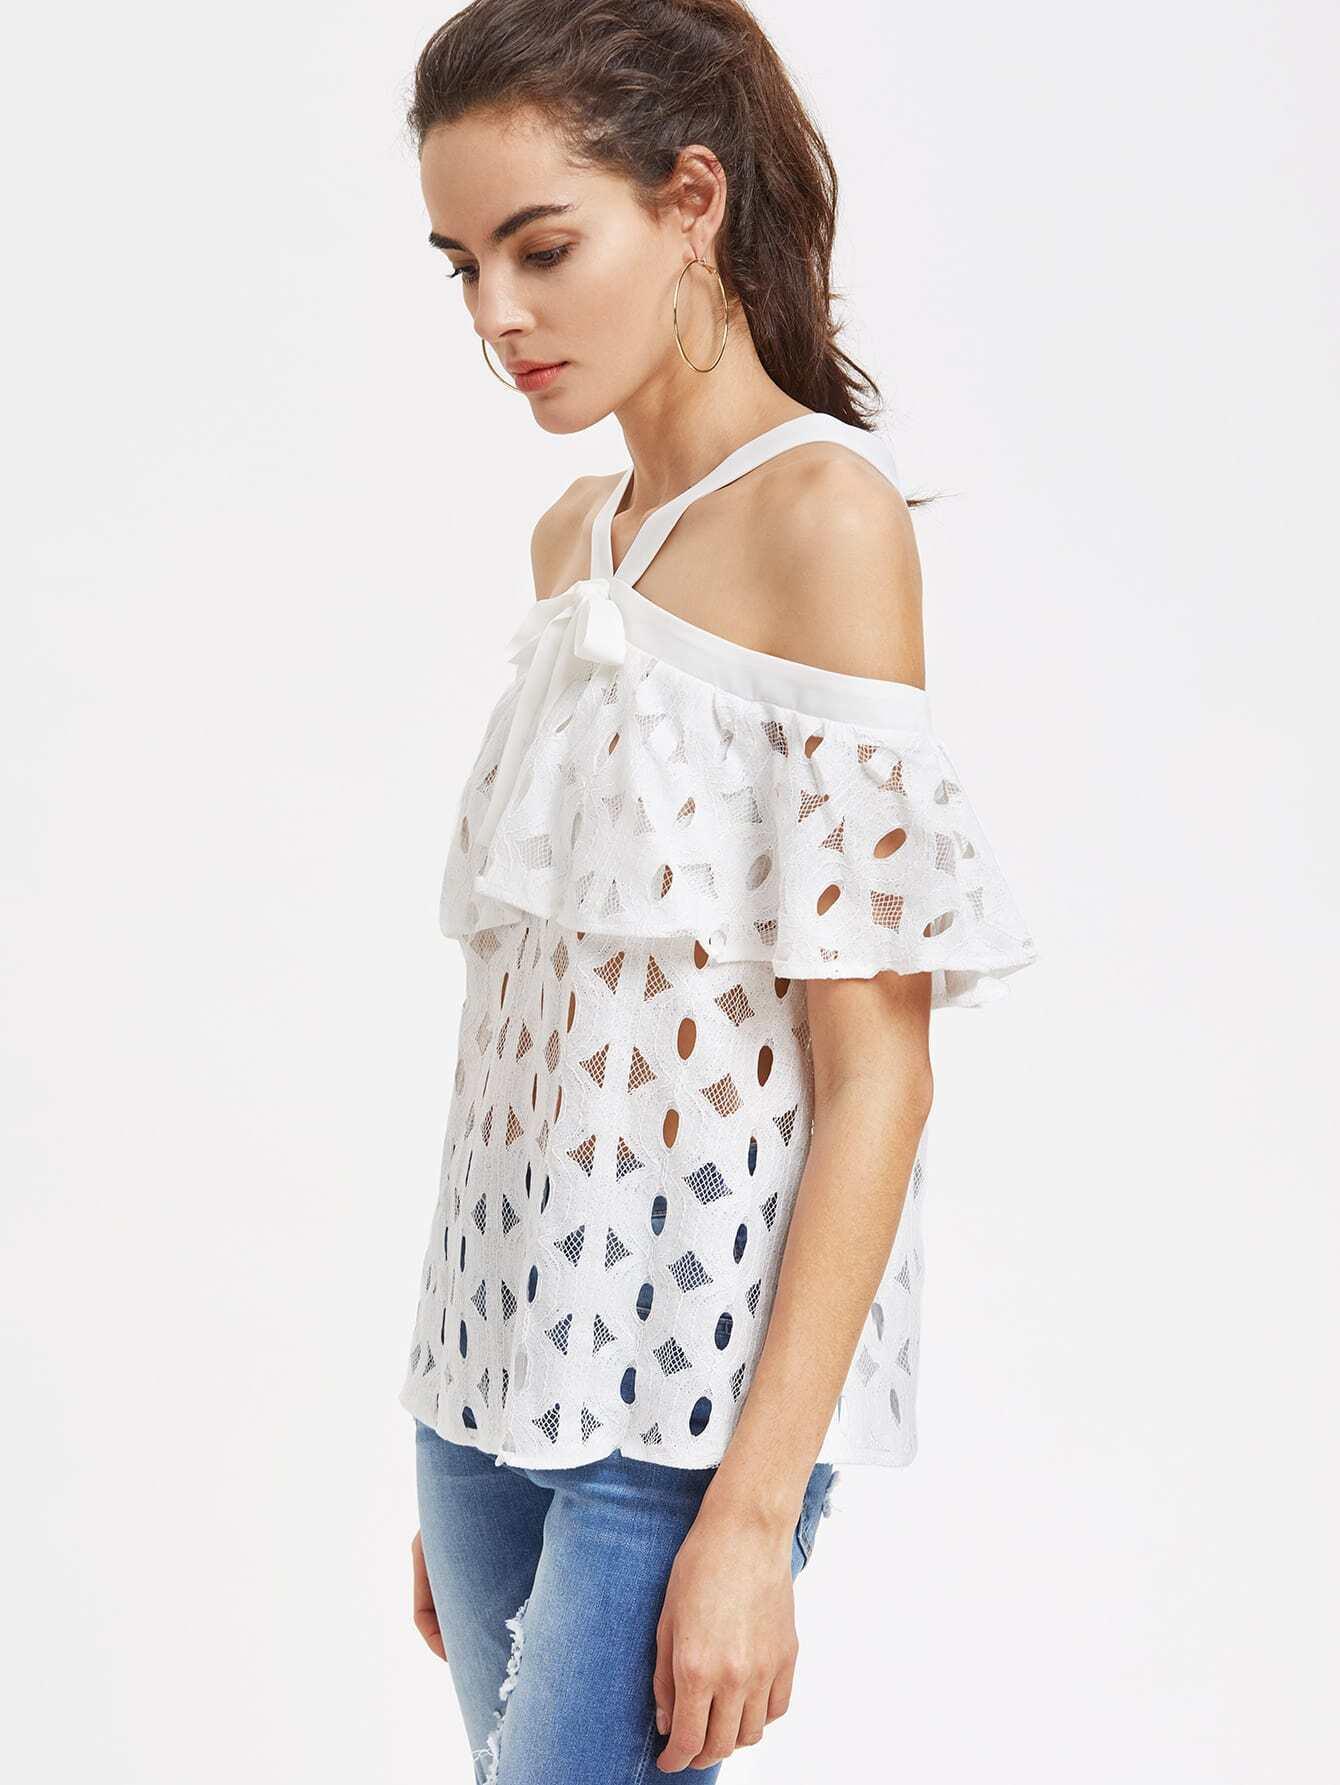 blouse170328709_2